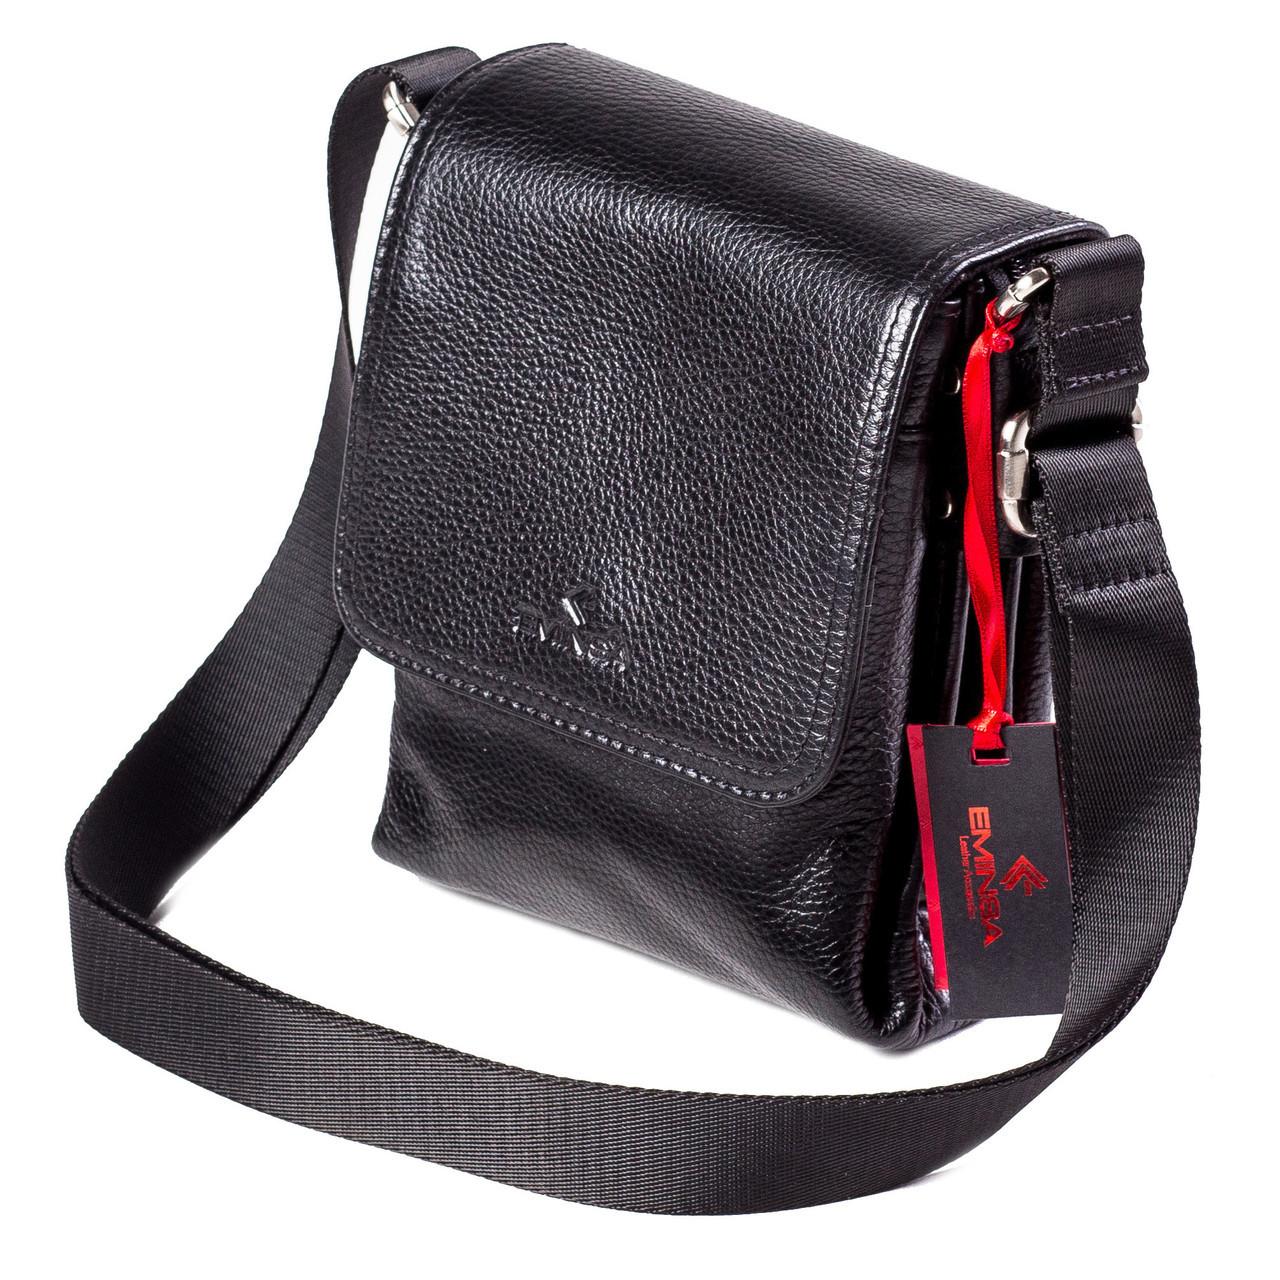 Мужская сумка кожаная чёрная Eminsa 6097-37-1  продаж 433ac57767311